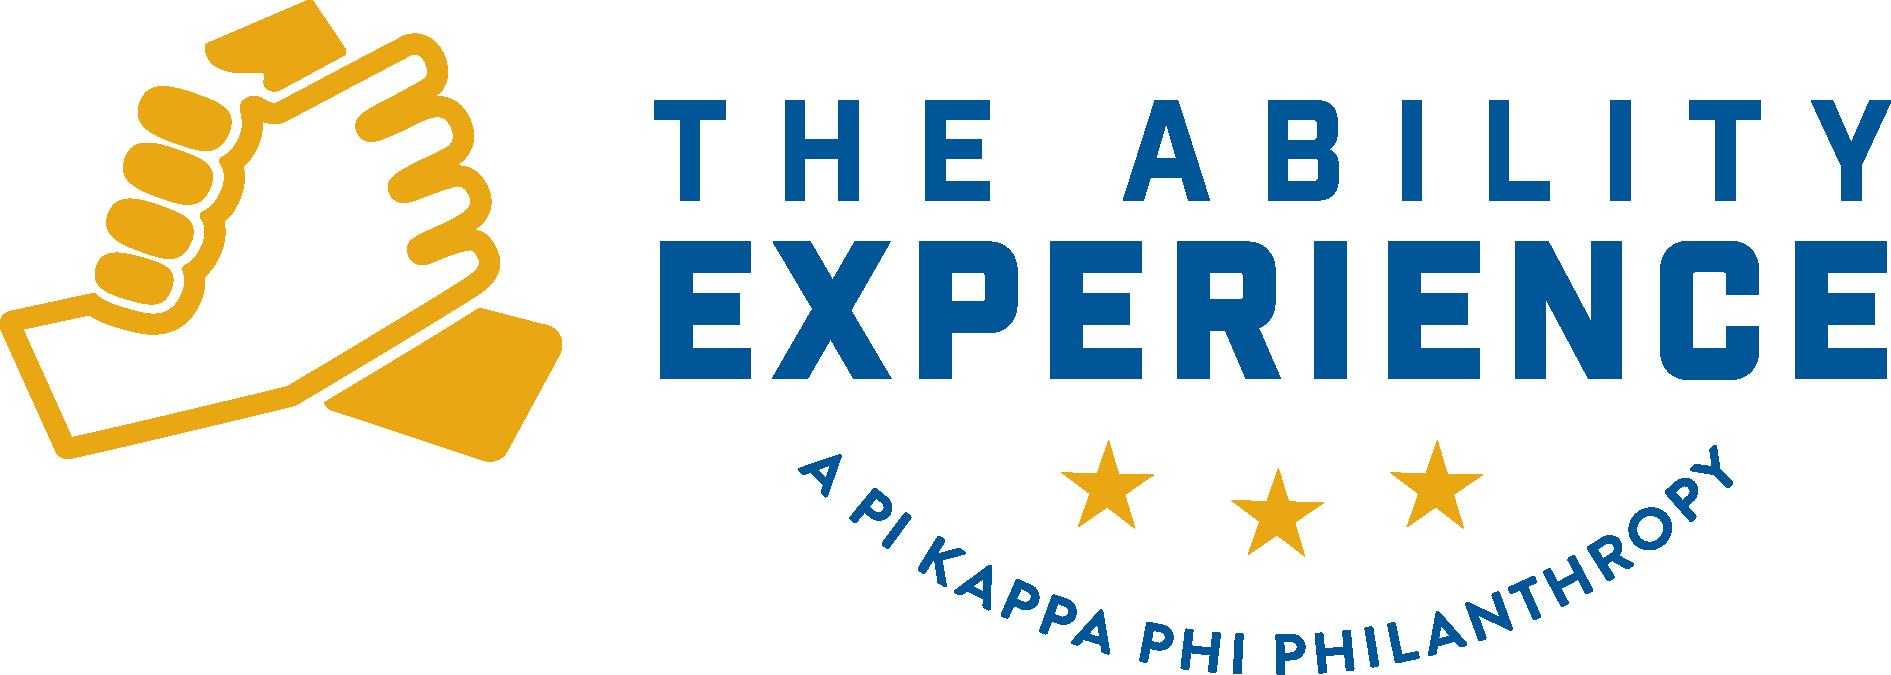 Ability_experience